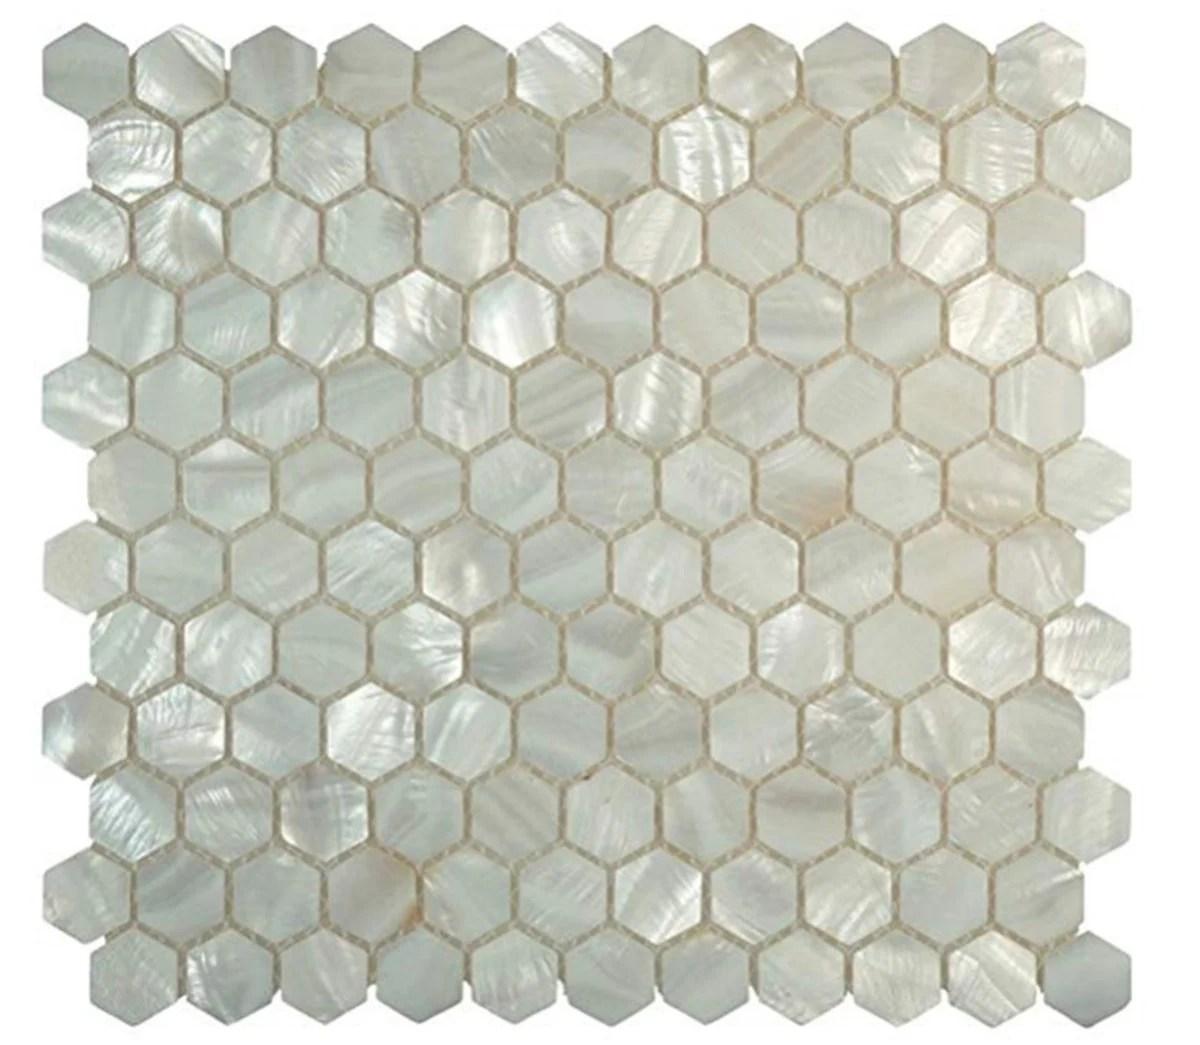 handmade genuine white hexagon mother of pearl mosaic tile for bathroom kitchen wall spa shower backsplash tile